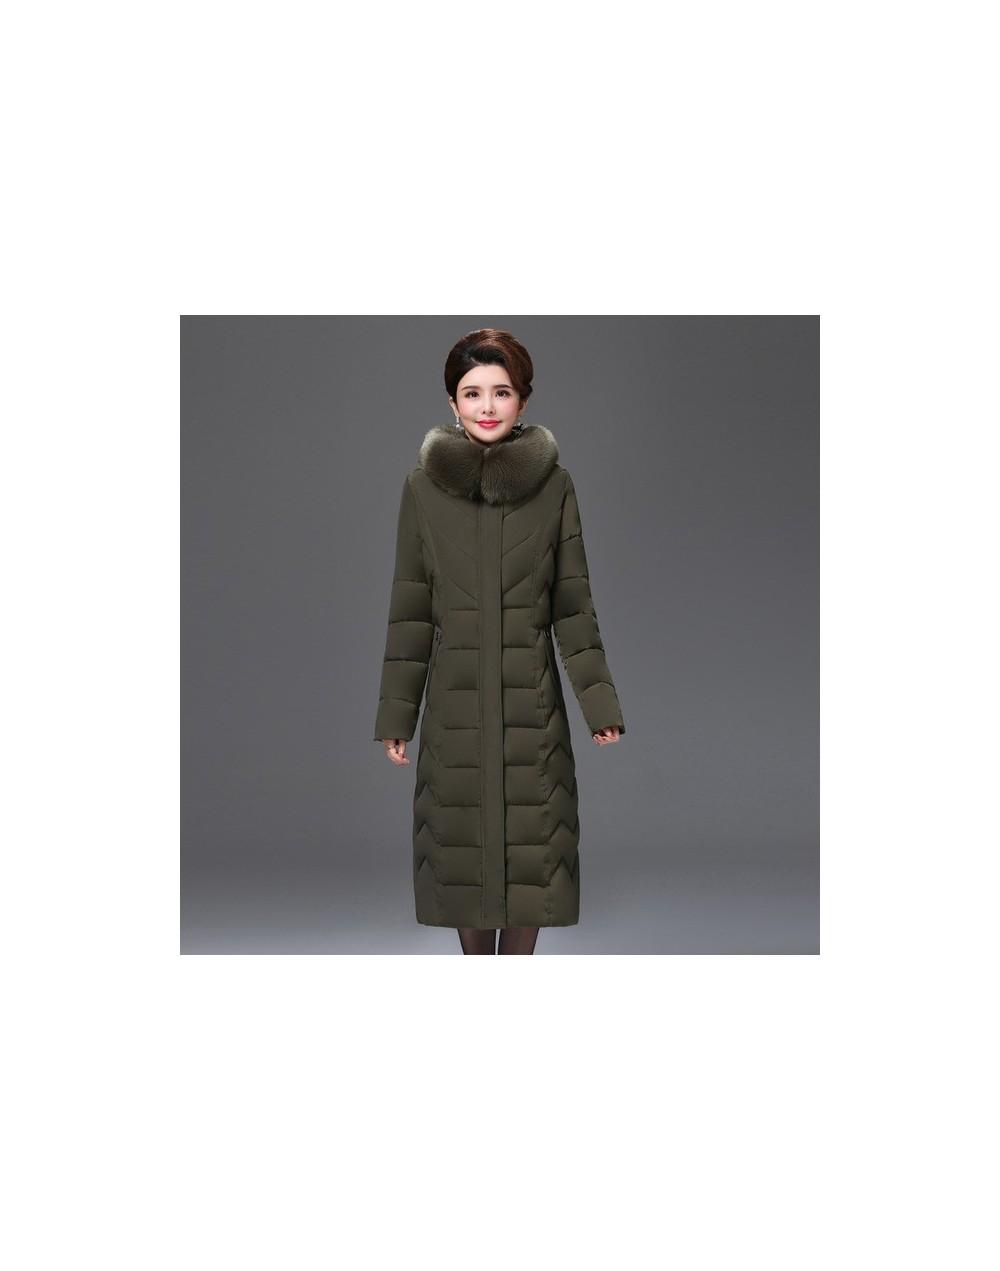 European style 2019 High Quality Winter Jacket Women X-long Fur Collar Hooded Female Plus Size 5XL 6XL Coat Warm Womens Park...